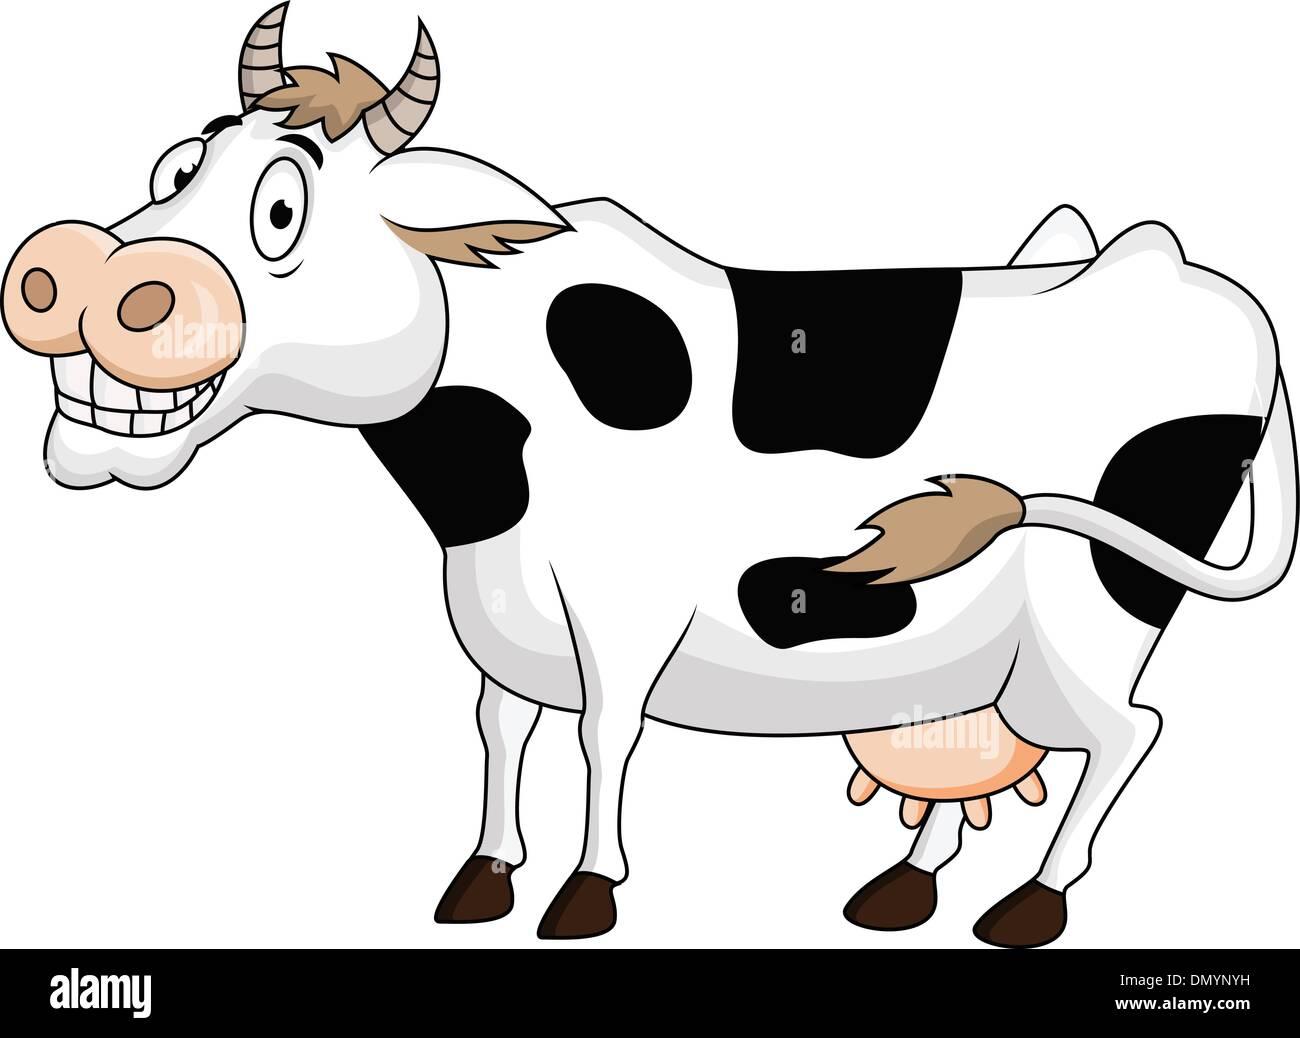 Lustige kuh bilder comic